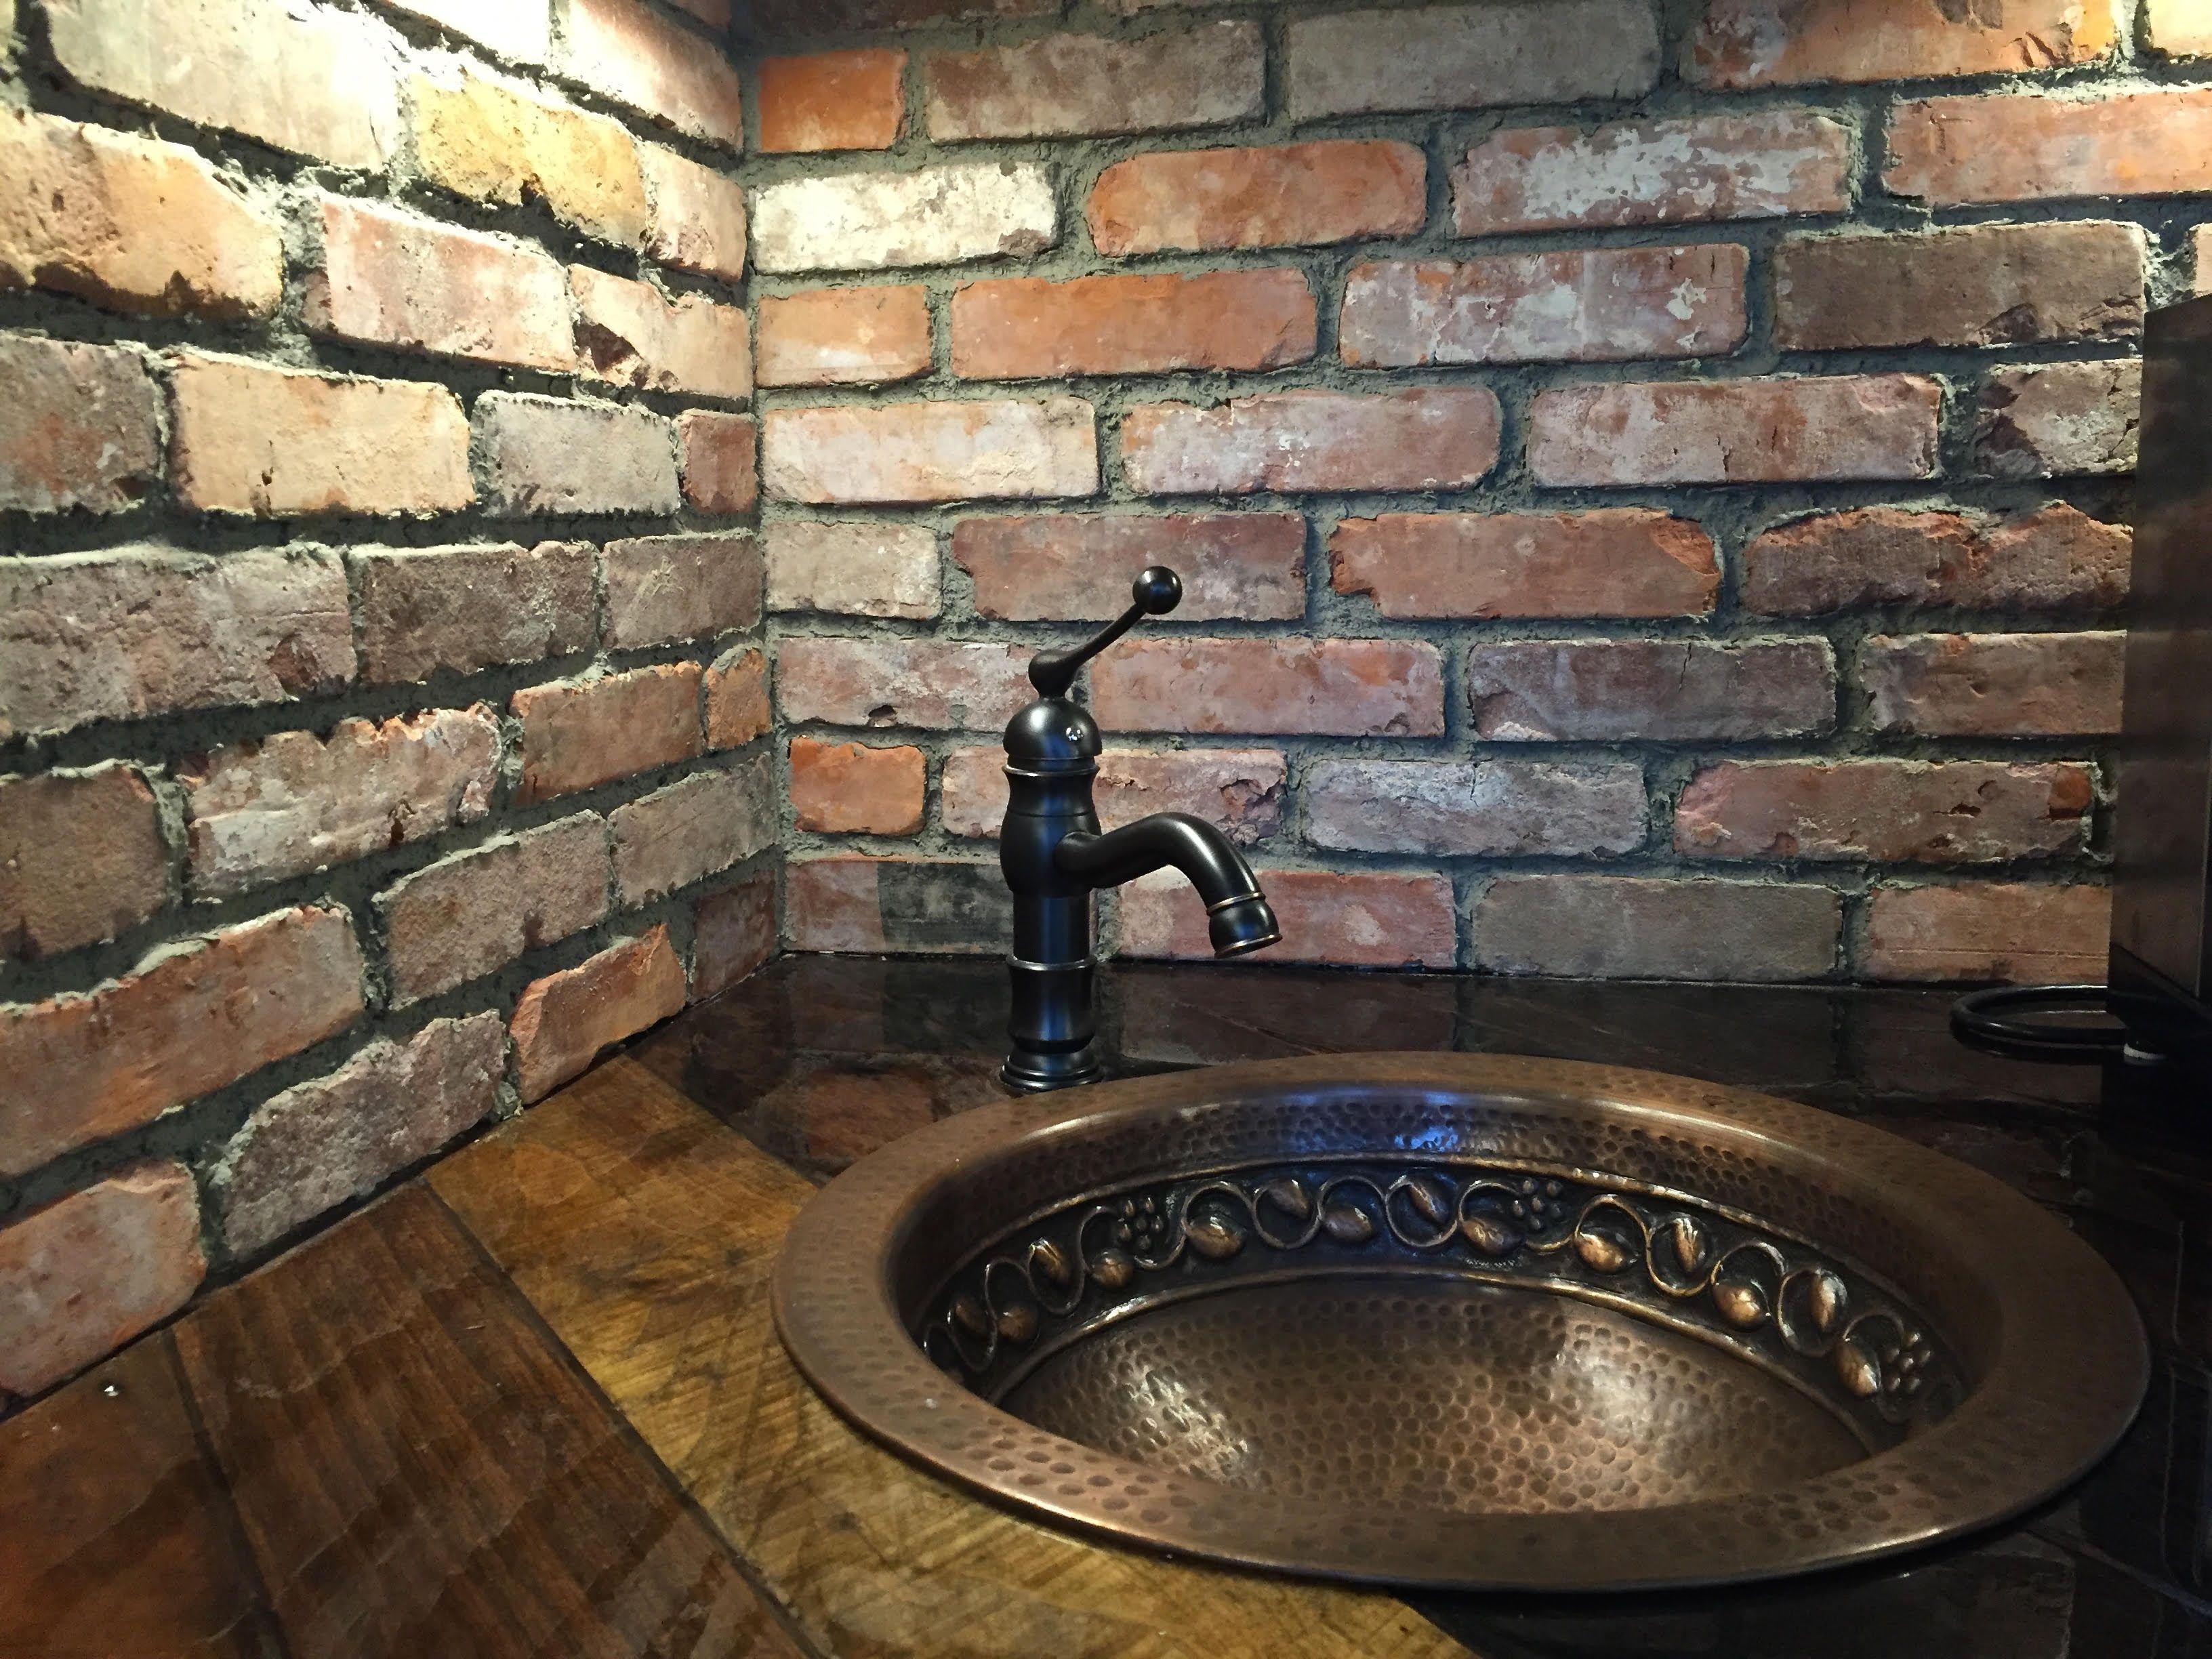 Baltimore Brick Veneer Reclaimed Backsplash Stone Farms